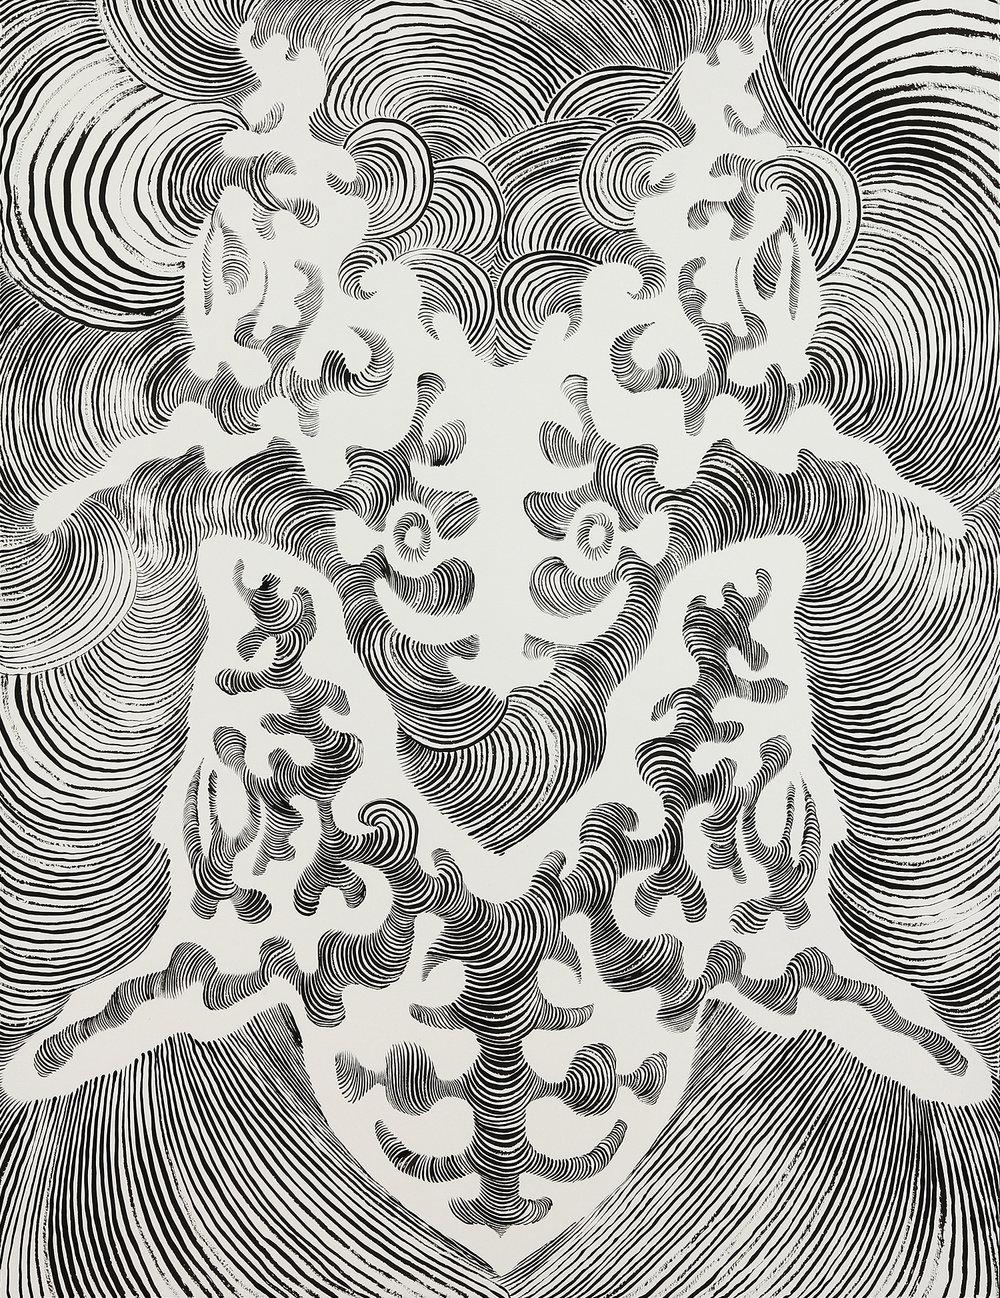 Cerebellum  sumi ink on paper 31x25in. 2016  (Brain Study Series)